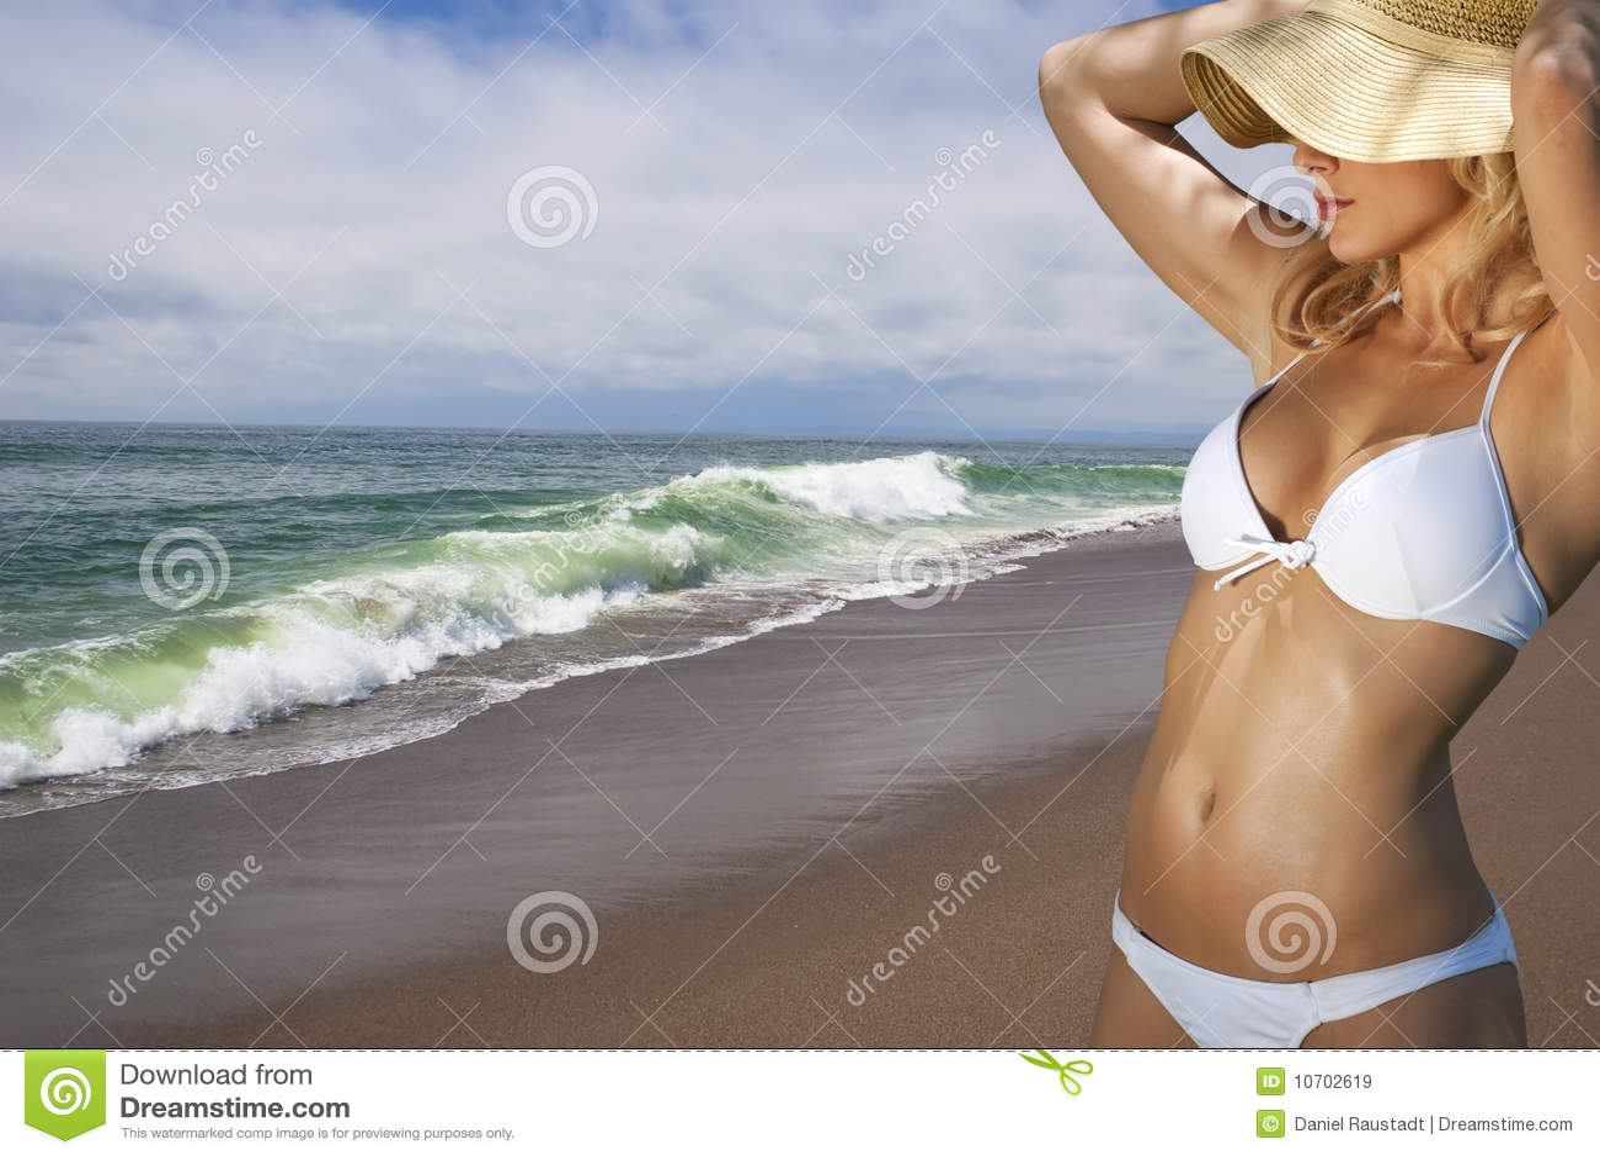 Mujer rubia joven vacationing en la playa